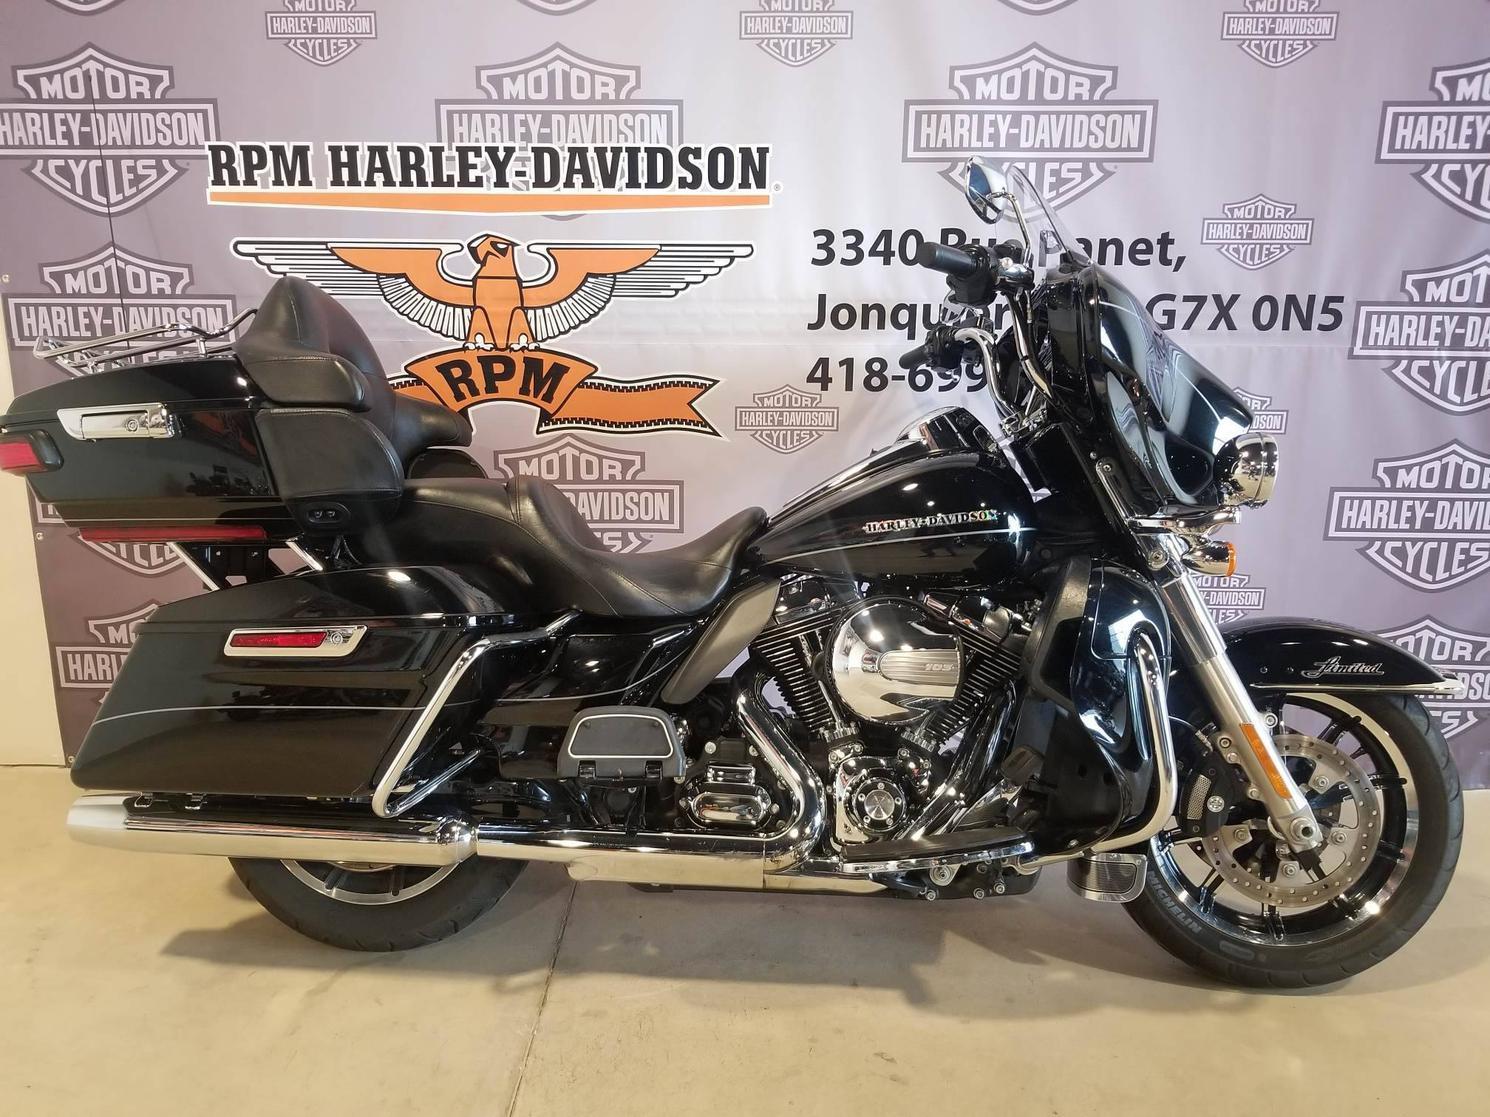 FB602604 Harley-Davidson Ultra Limited 2015